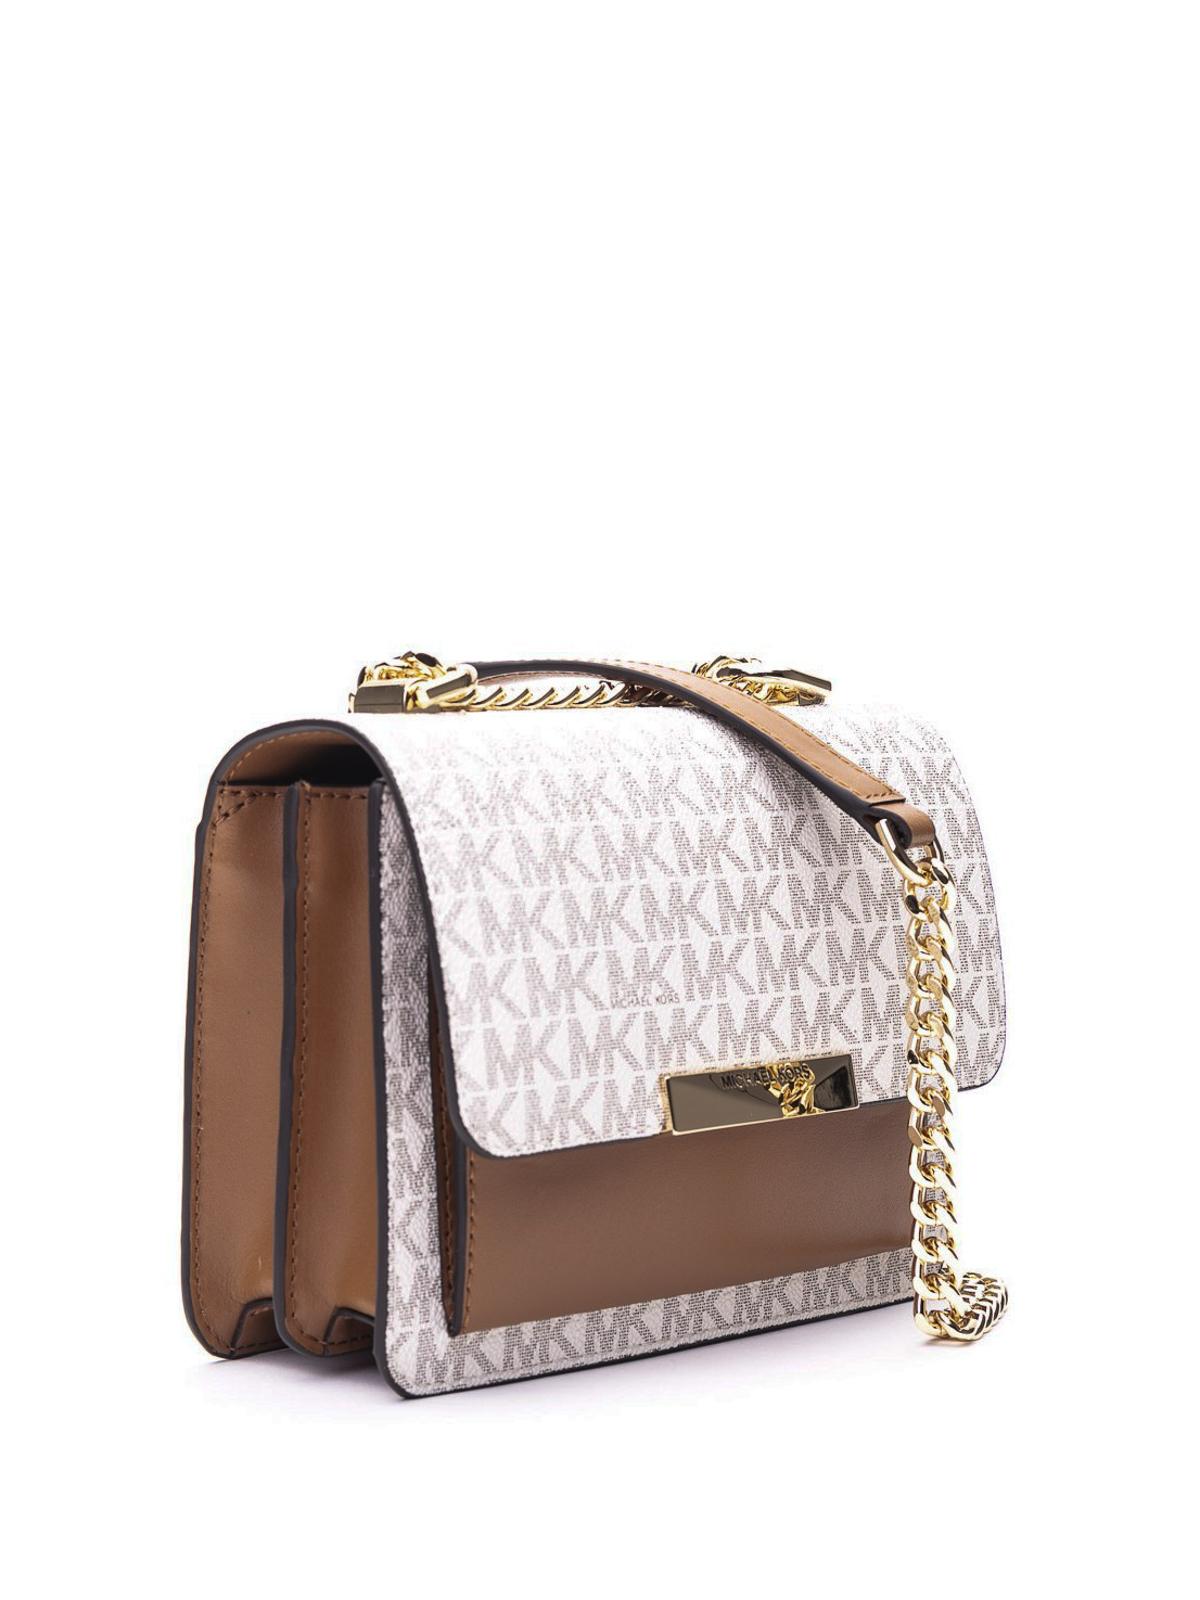 Michael Kors - Jade extra small bag - کیف کج - 32H9GJ4C0B149 | iKRIX